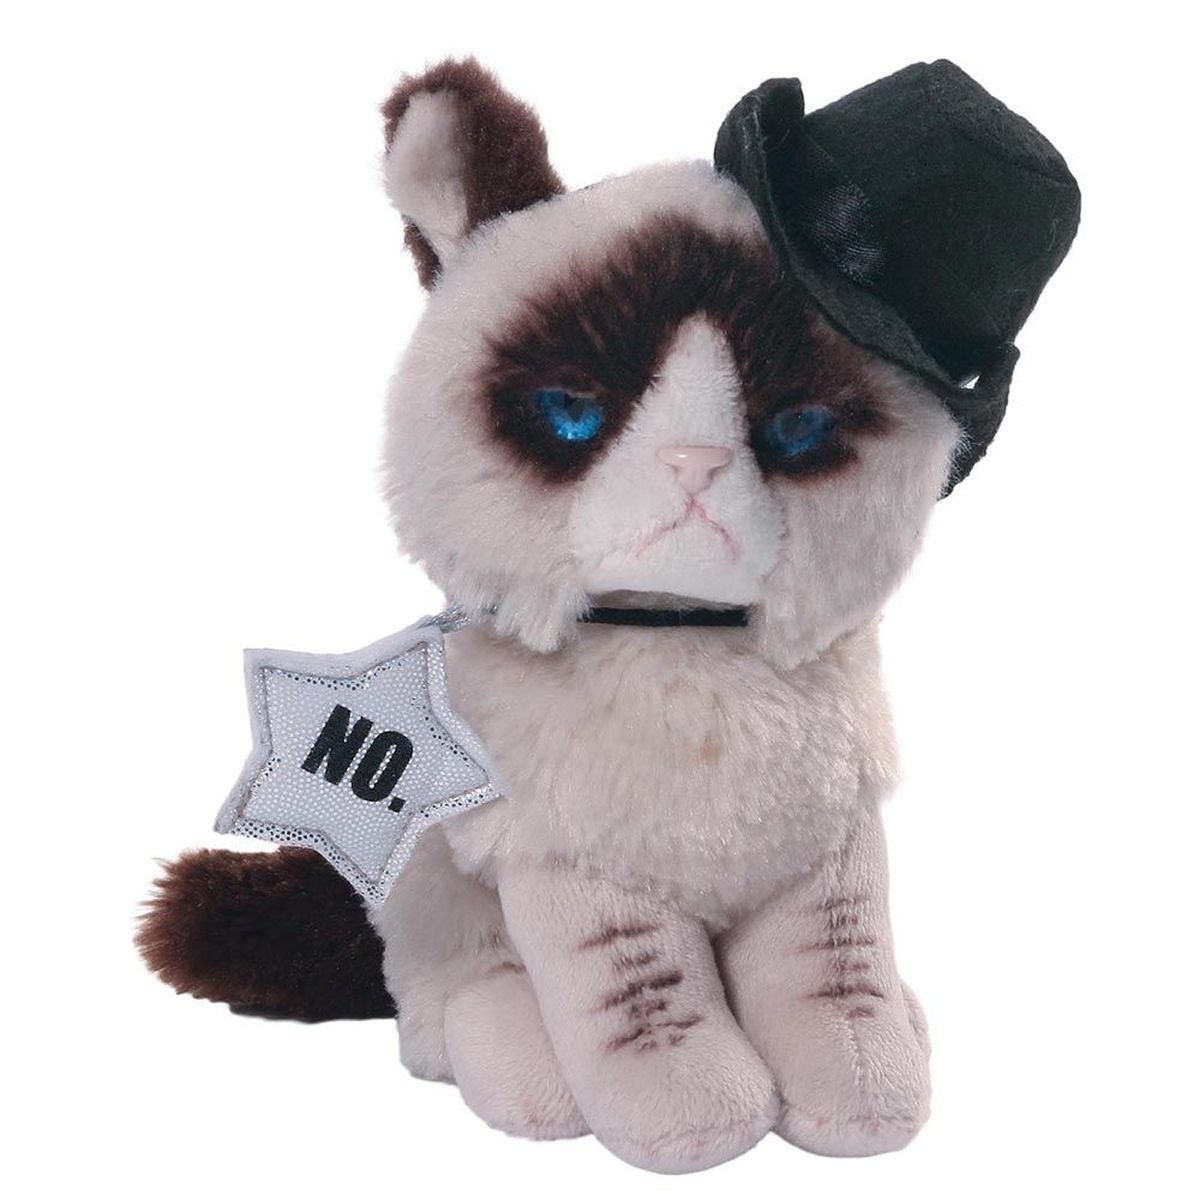 Gund Мягкая игрушка Grumpy Cat Cowboy 12,5 см gund мягкая игрушка grumpy cat 23 см